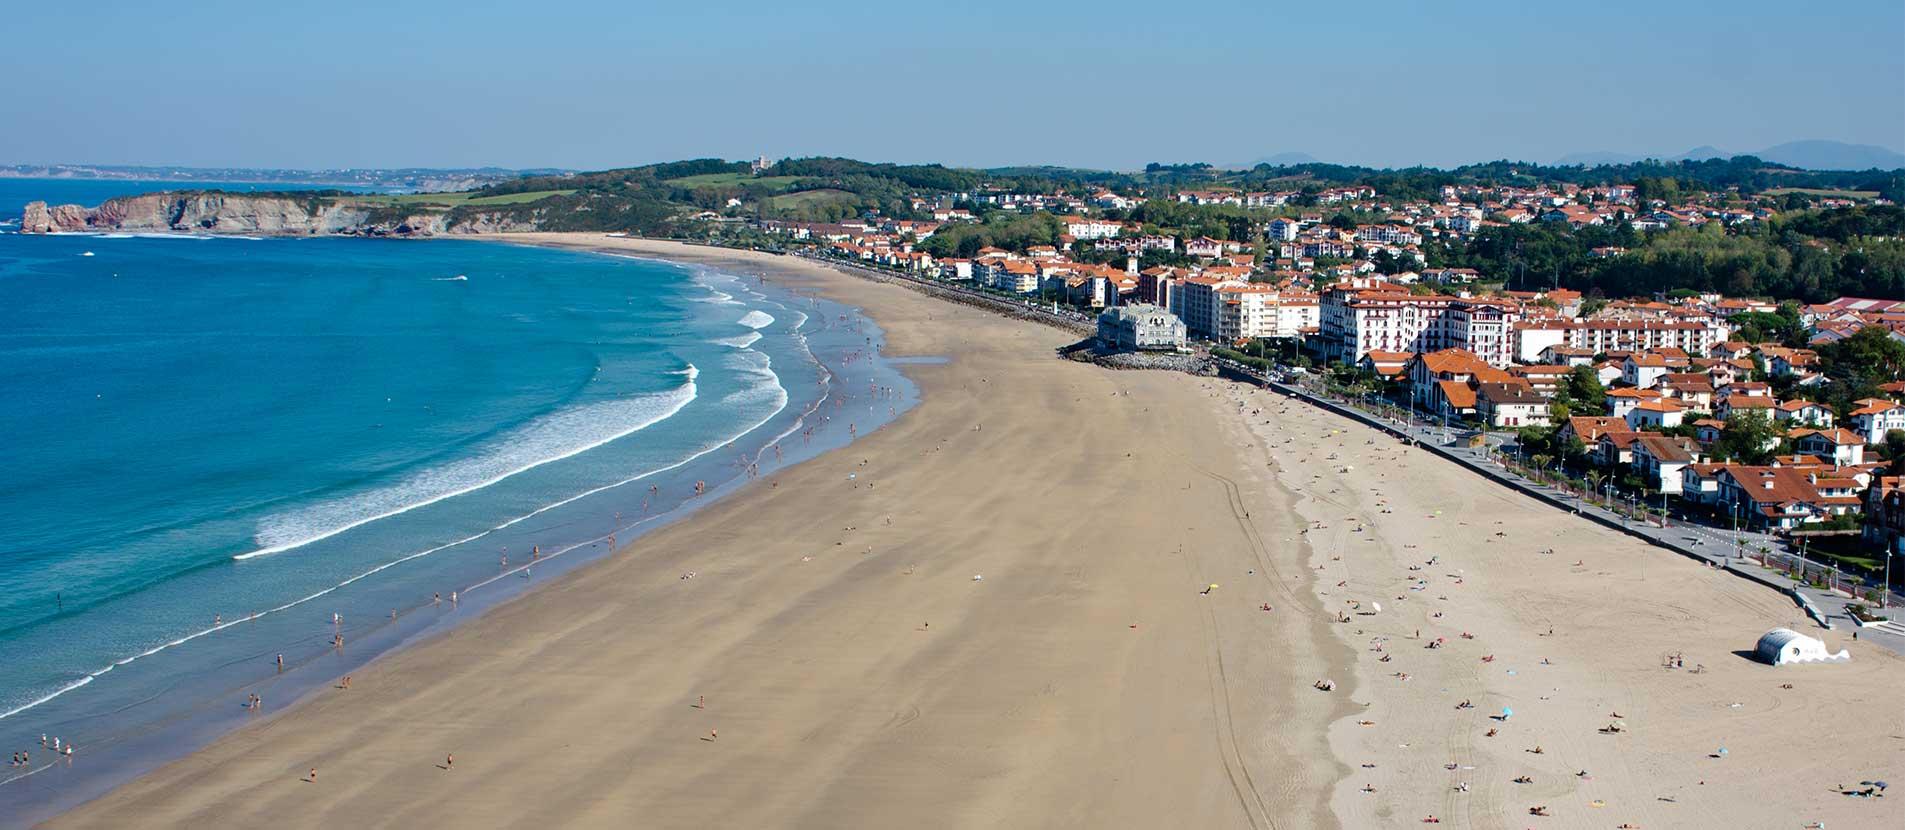 hendaye-pays-basque-lehena.jpg